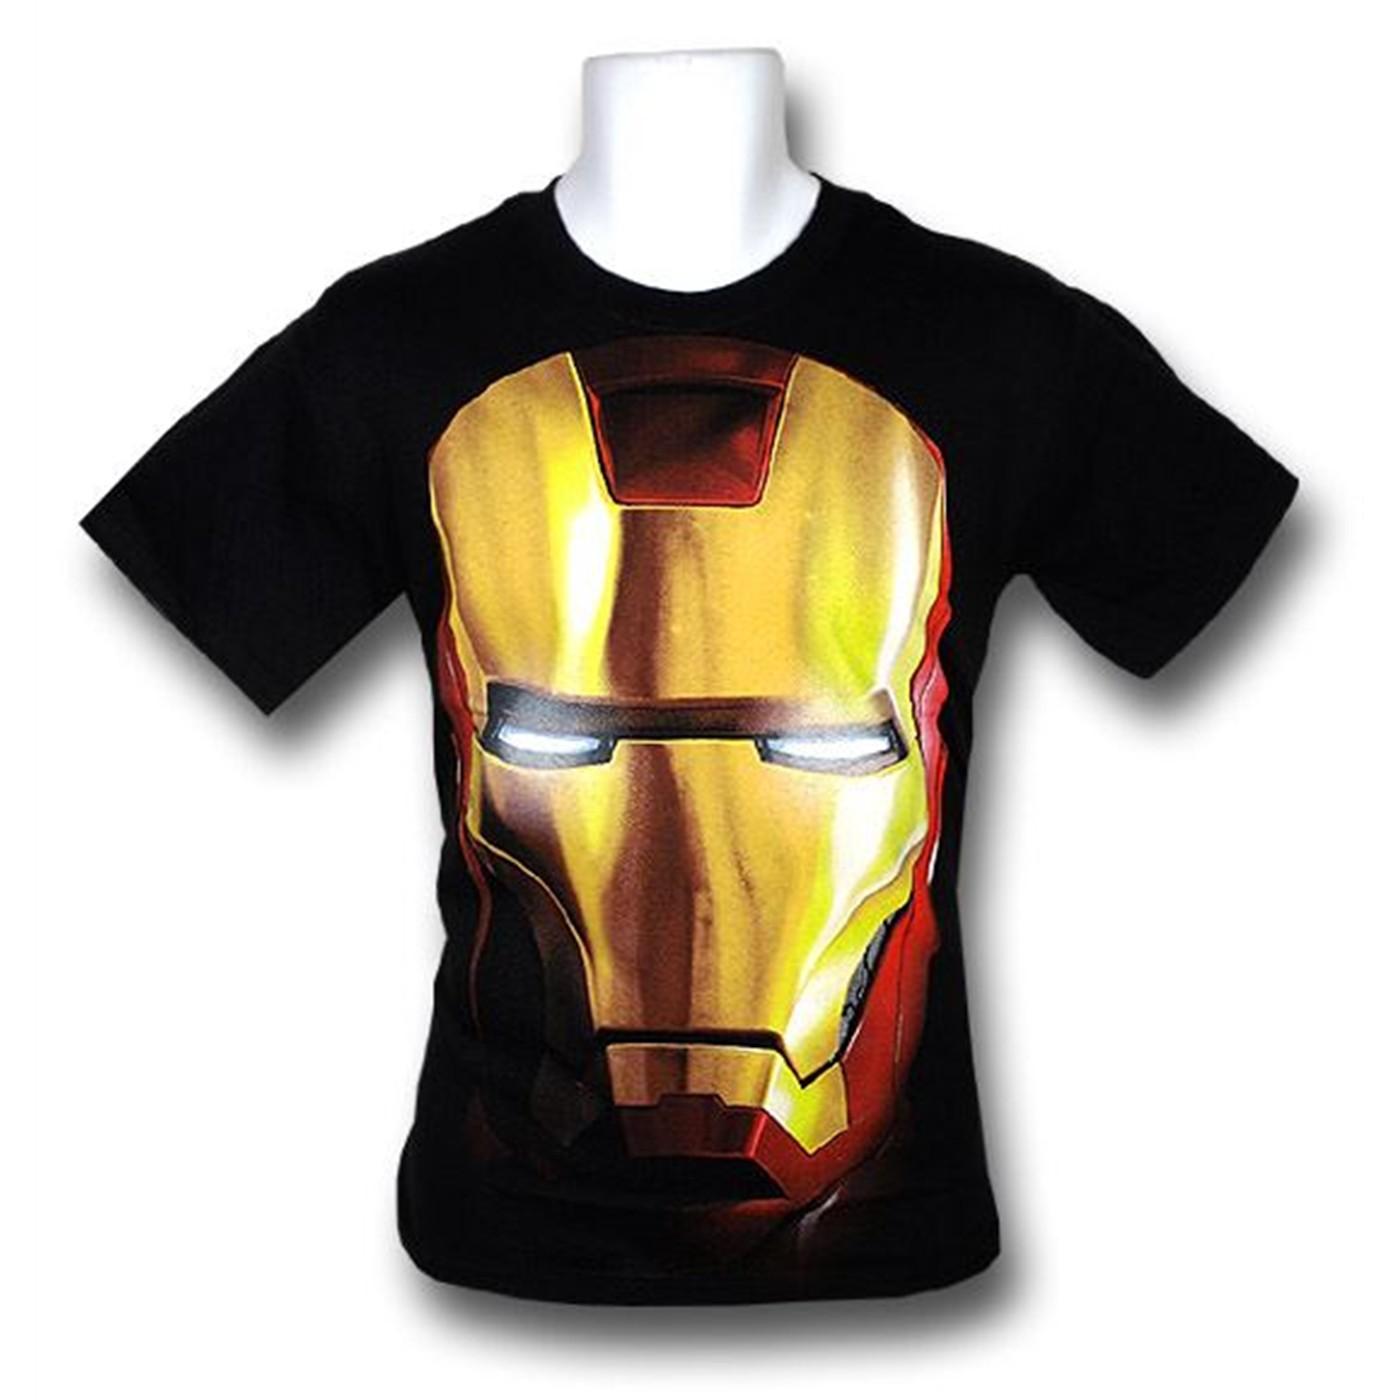 Iron Man 2 Movie Helmet T-Shirt